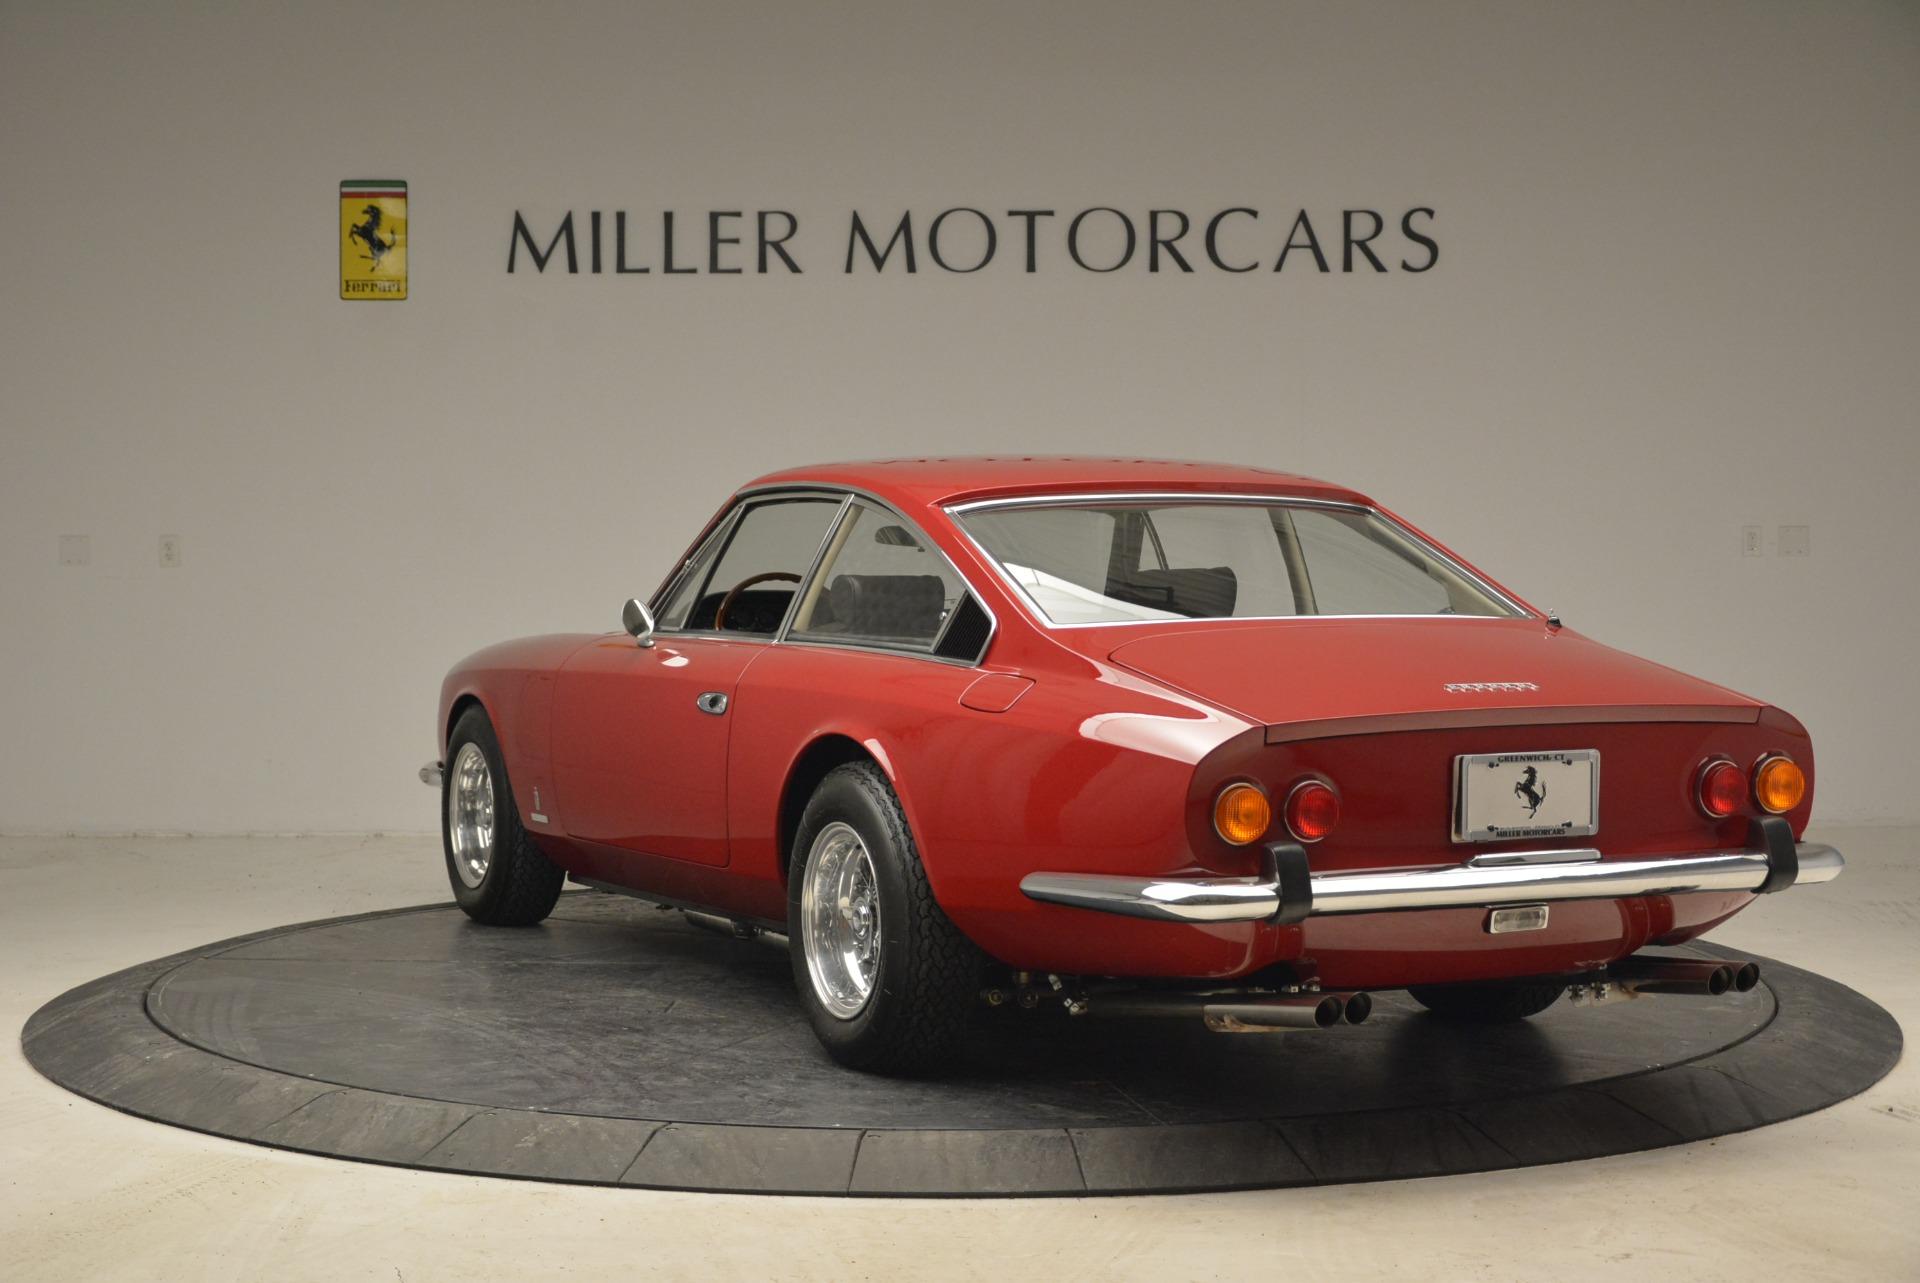 Used 1969 Ferrari 365 GT 2+2  For Sale In Greenwich, CT 1995_p5